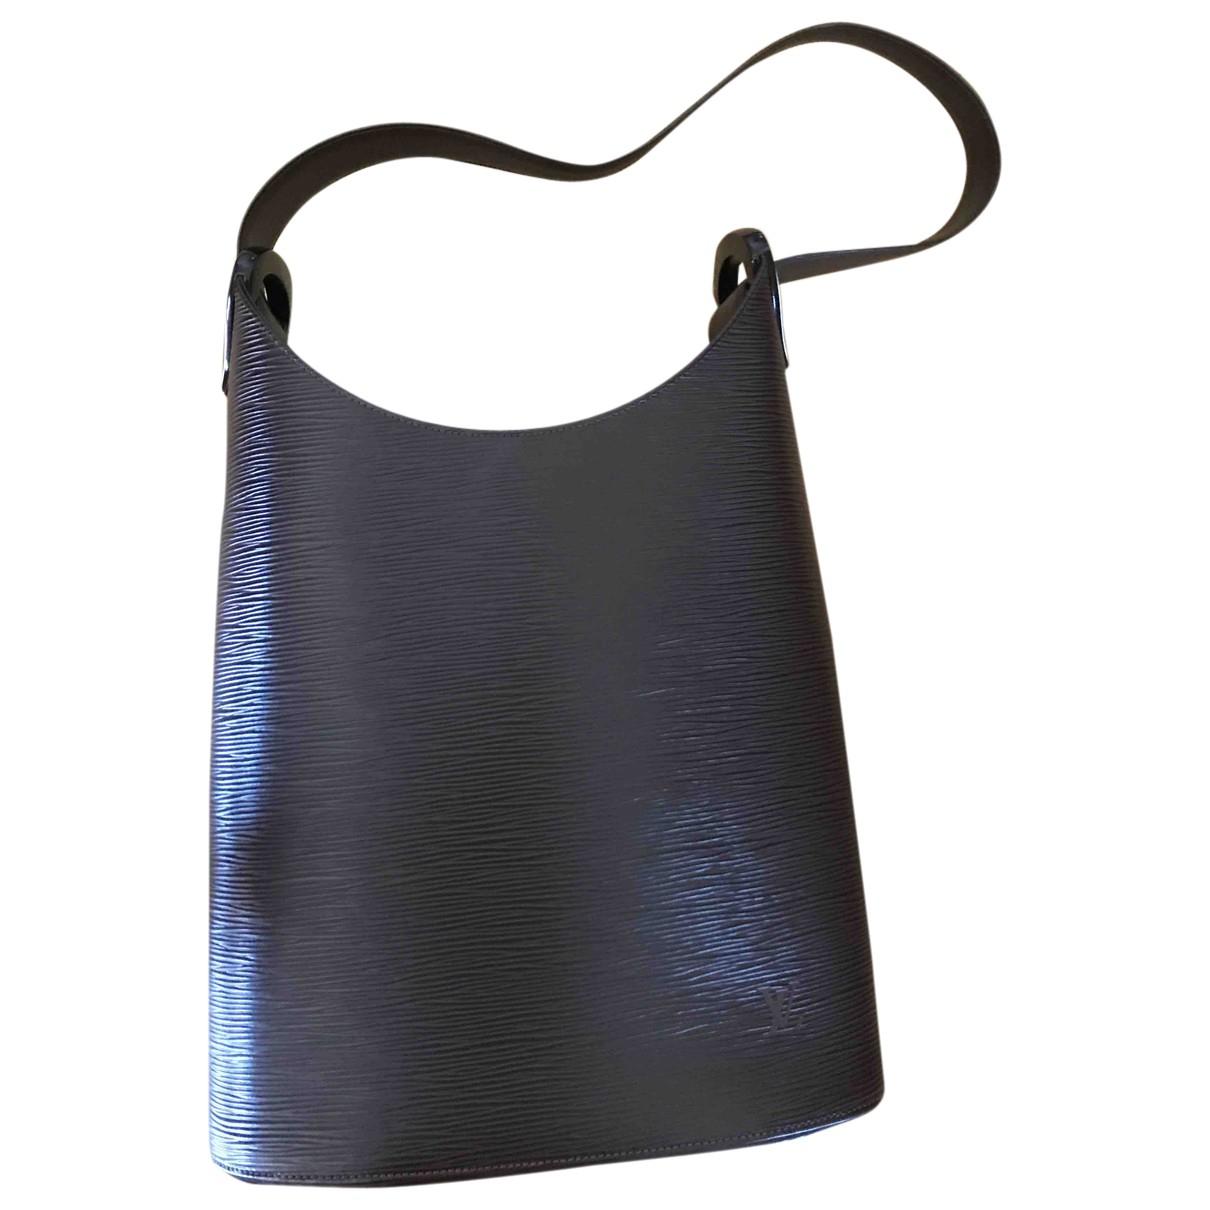 Louis Vuitton Verseau  Brown Leather handbag for Women \N